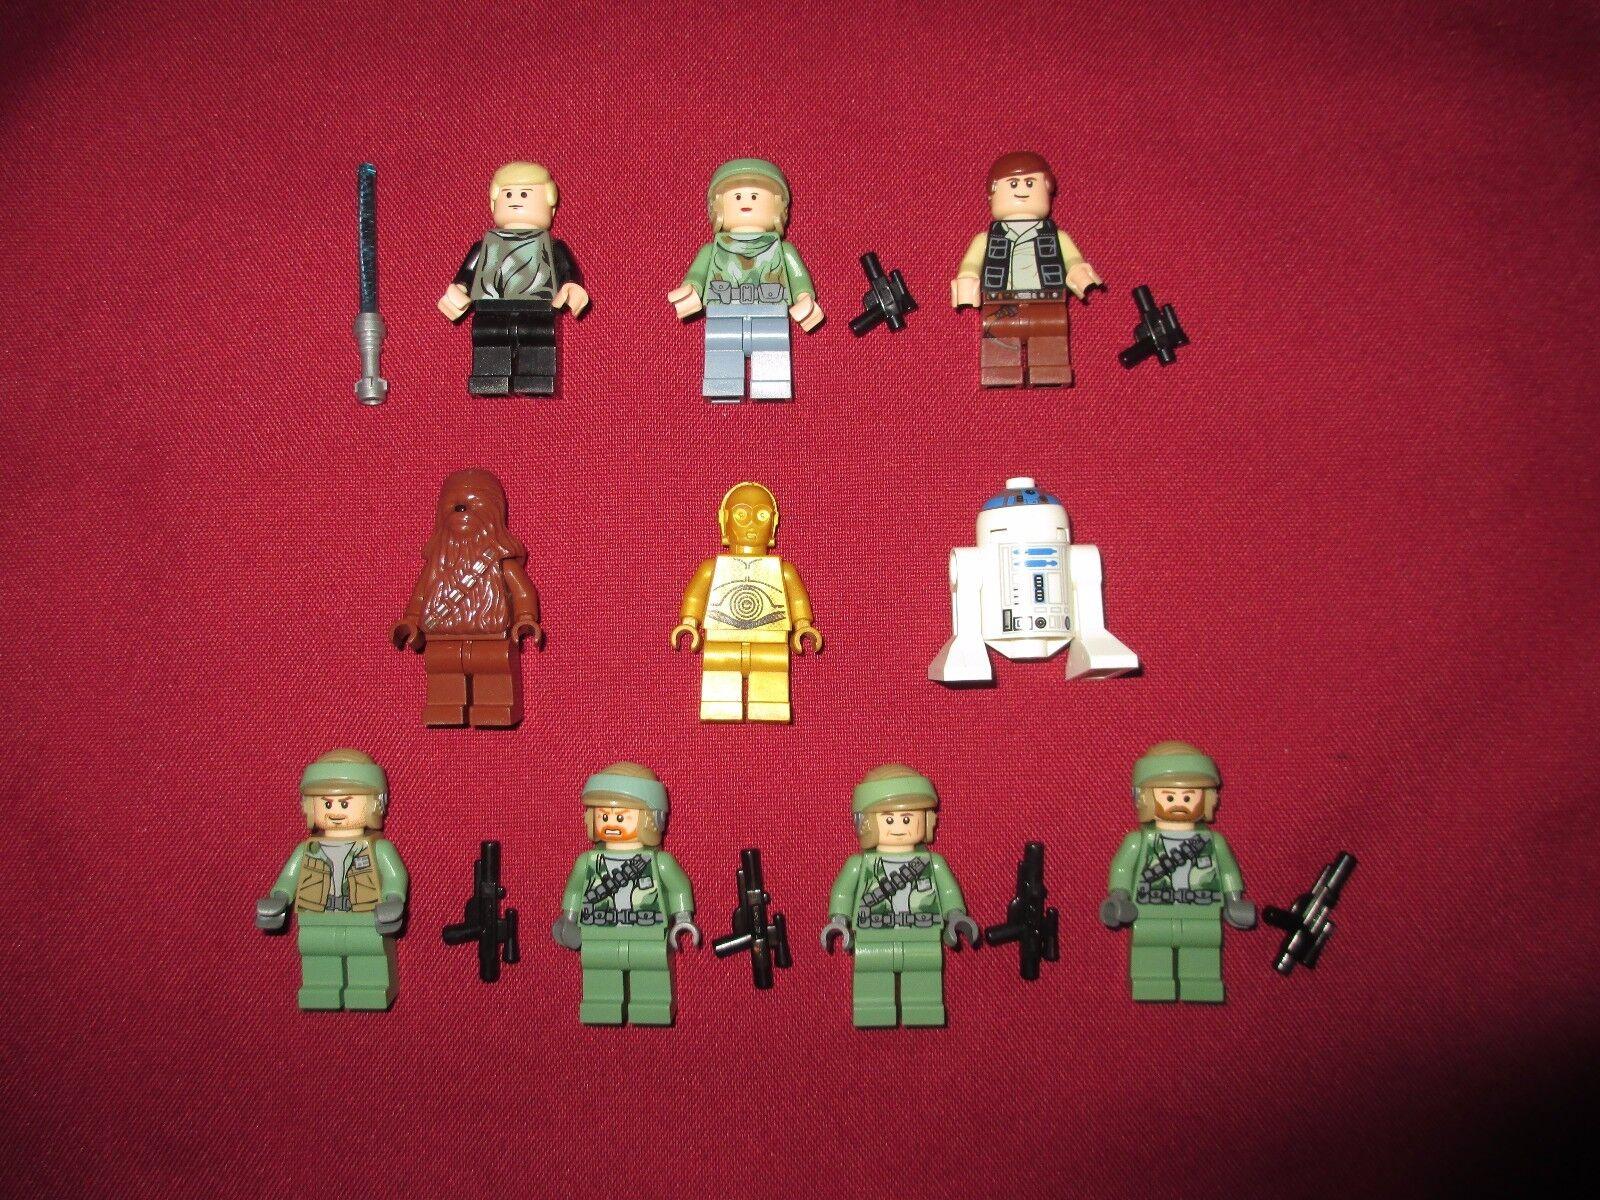 LEGO Star Wars Minifigure LOT Endor Soldiers , , , Leia , Luke ,Han, Chewy,C3po R2 a97494